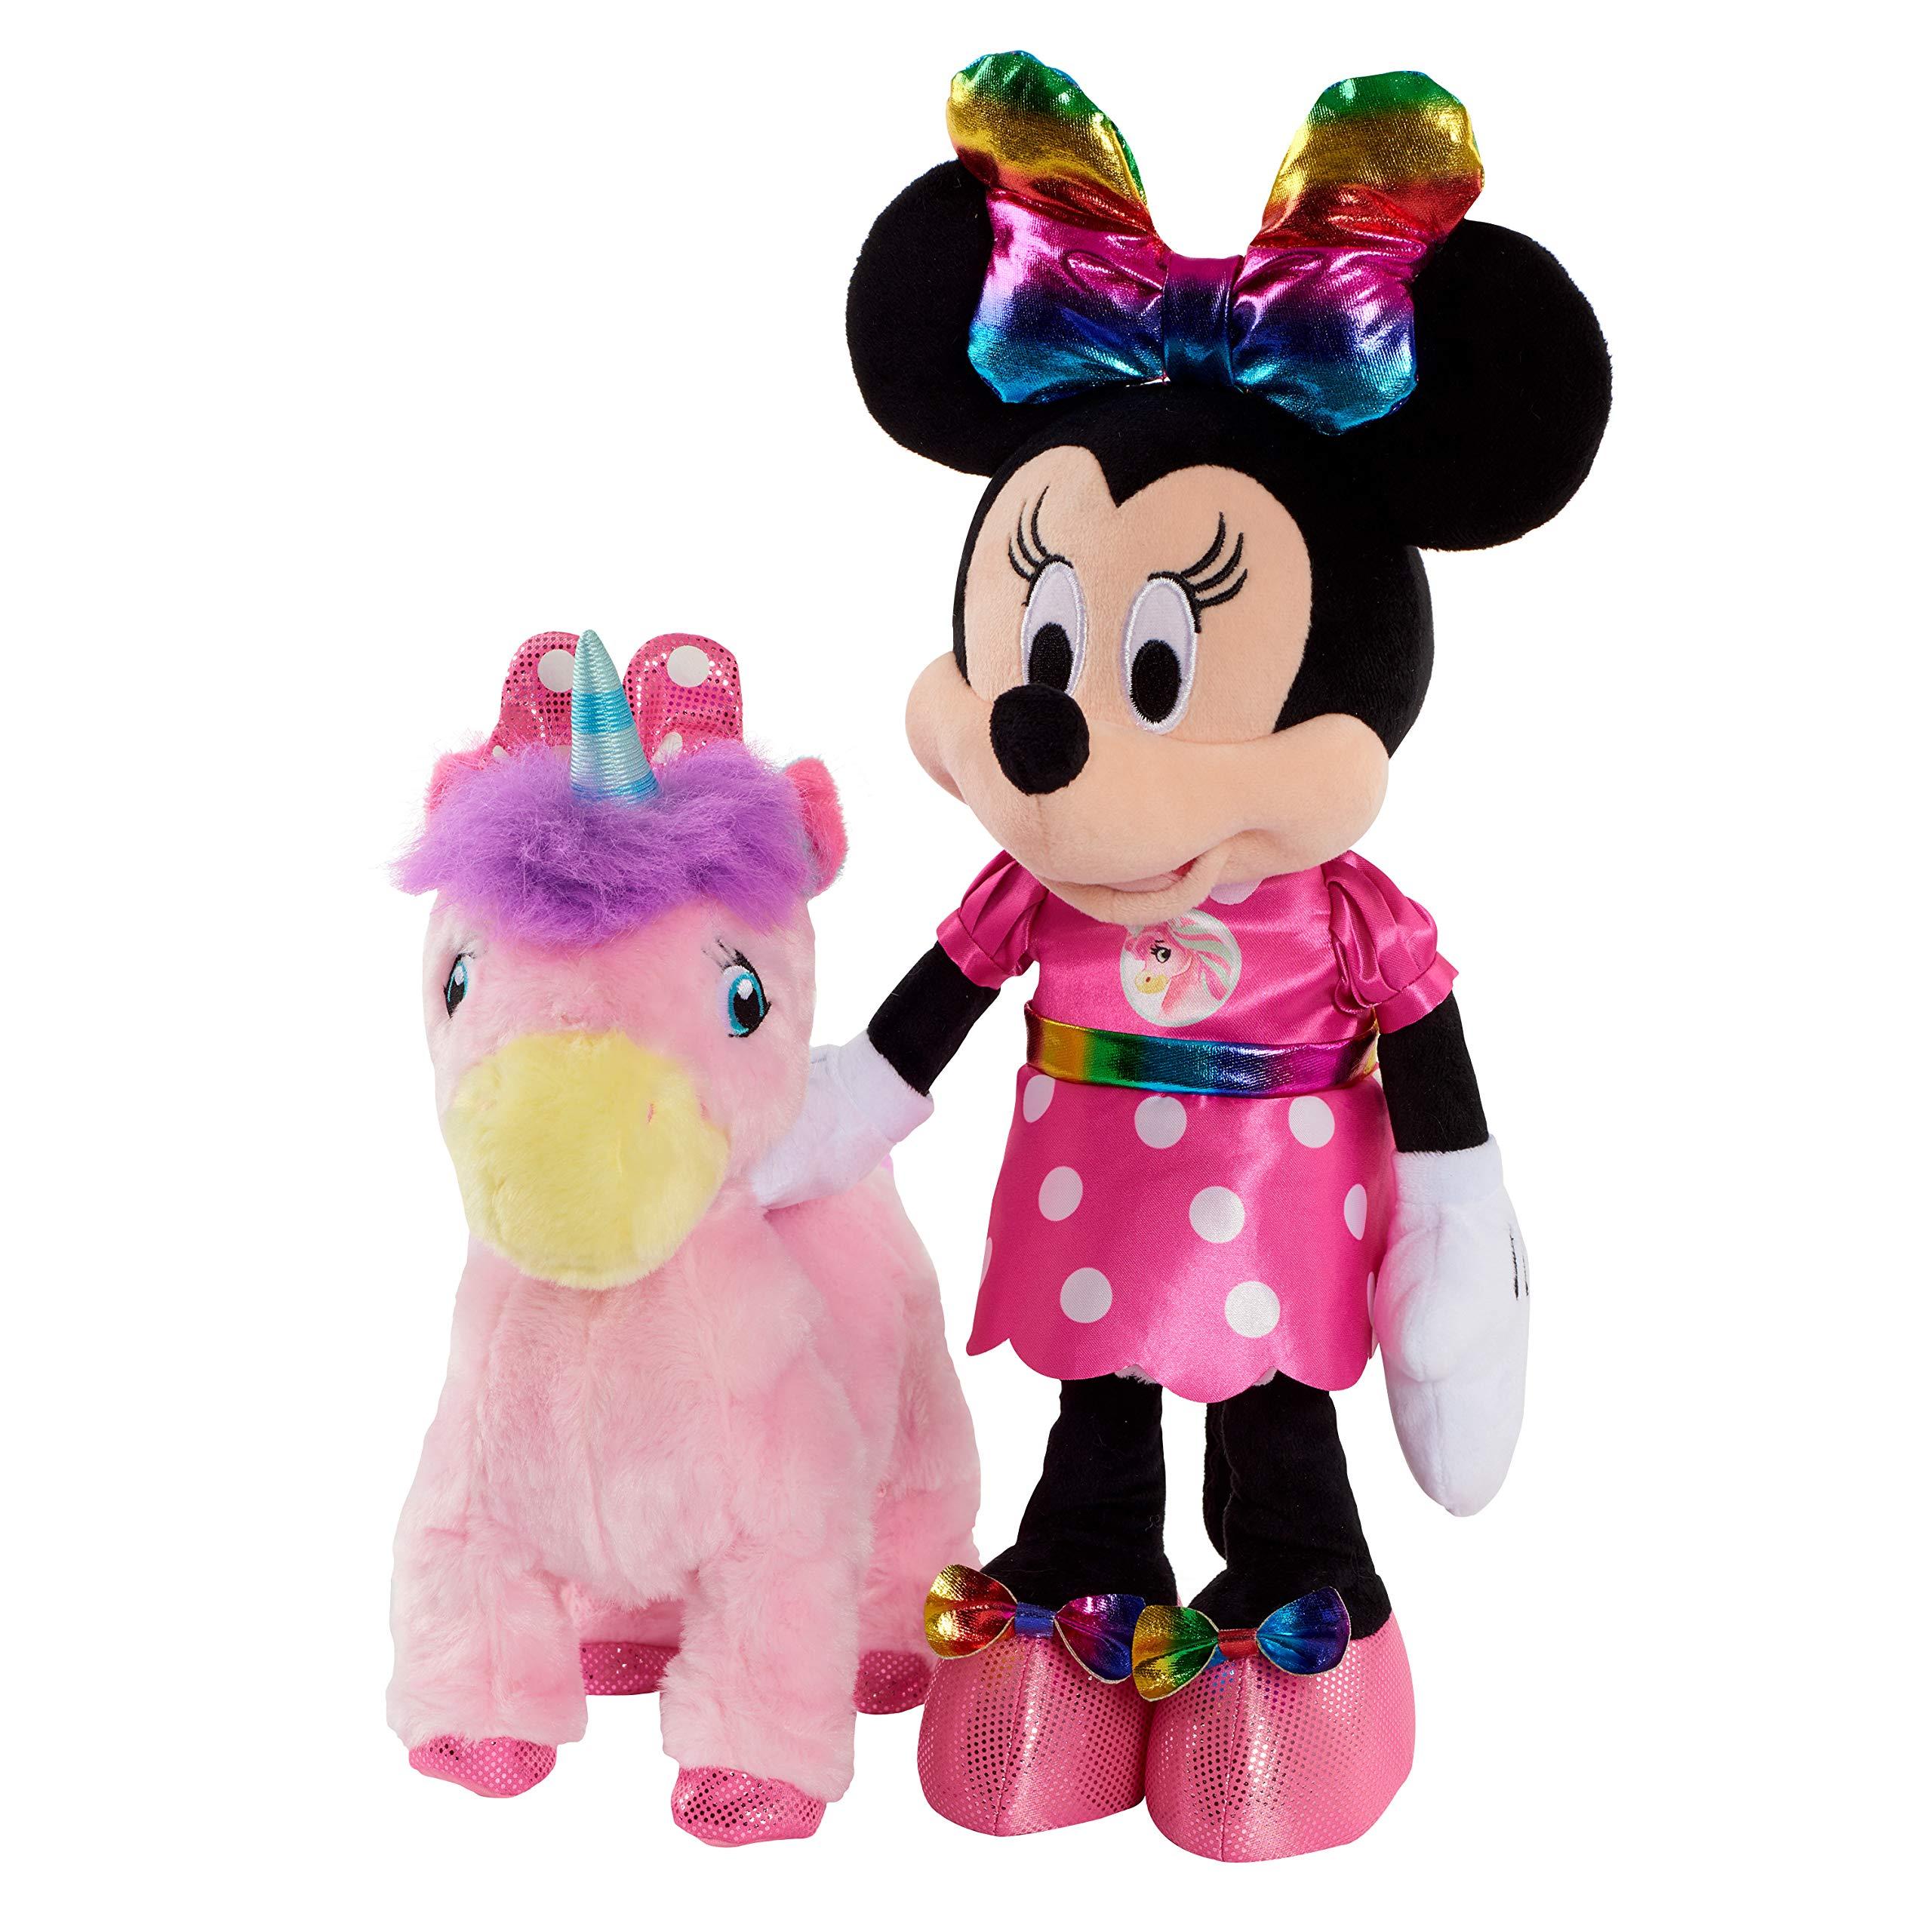 Minnie Walk & Dance Unicorn Feature Plush by Minnie Mouse